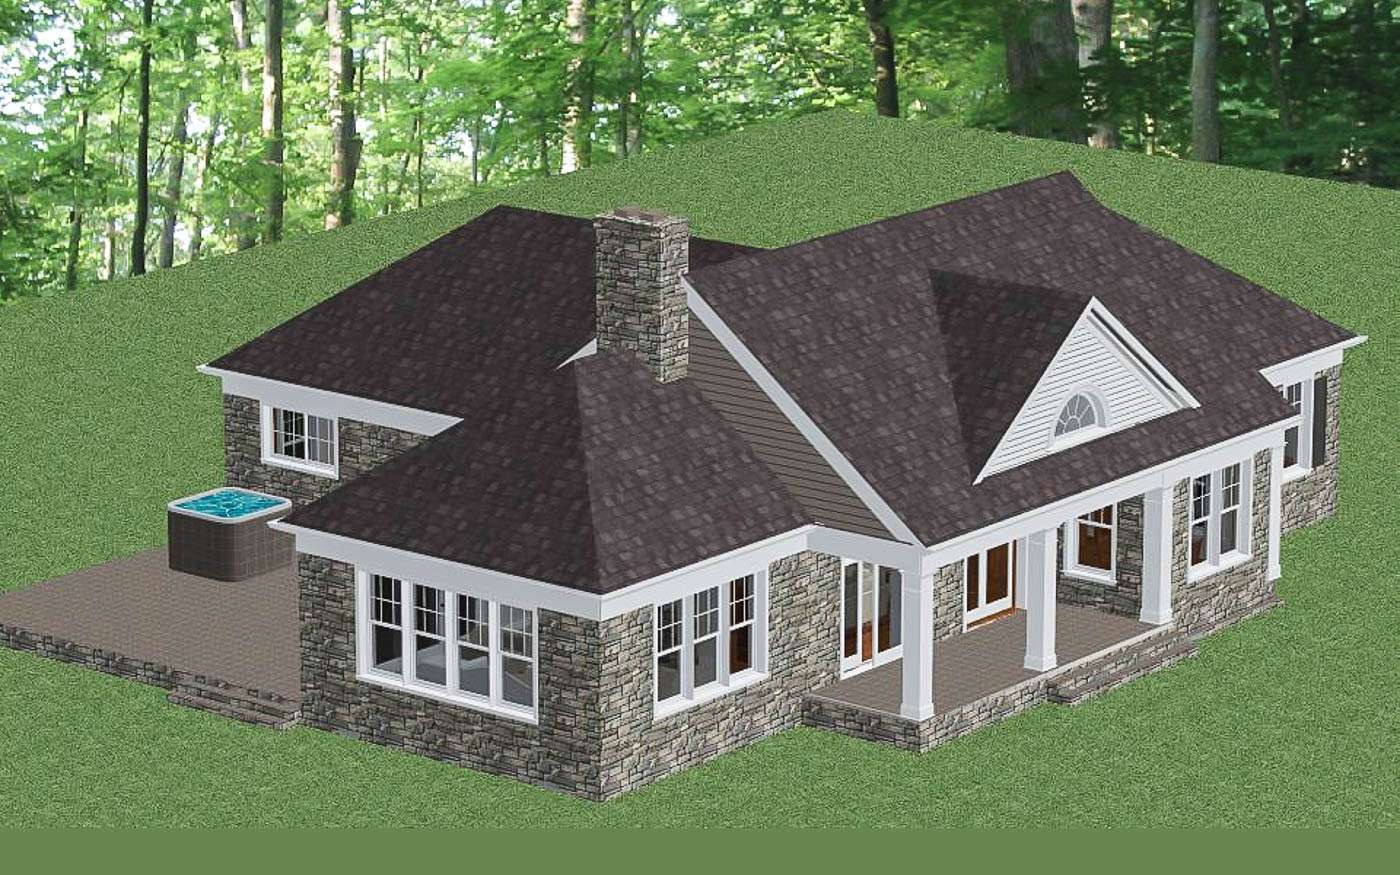 Shenandoah Stone Cottage Overview